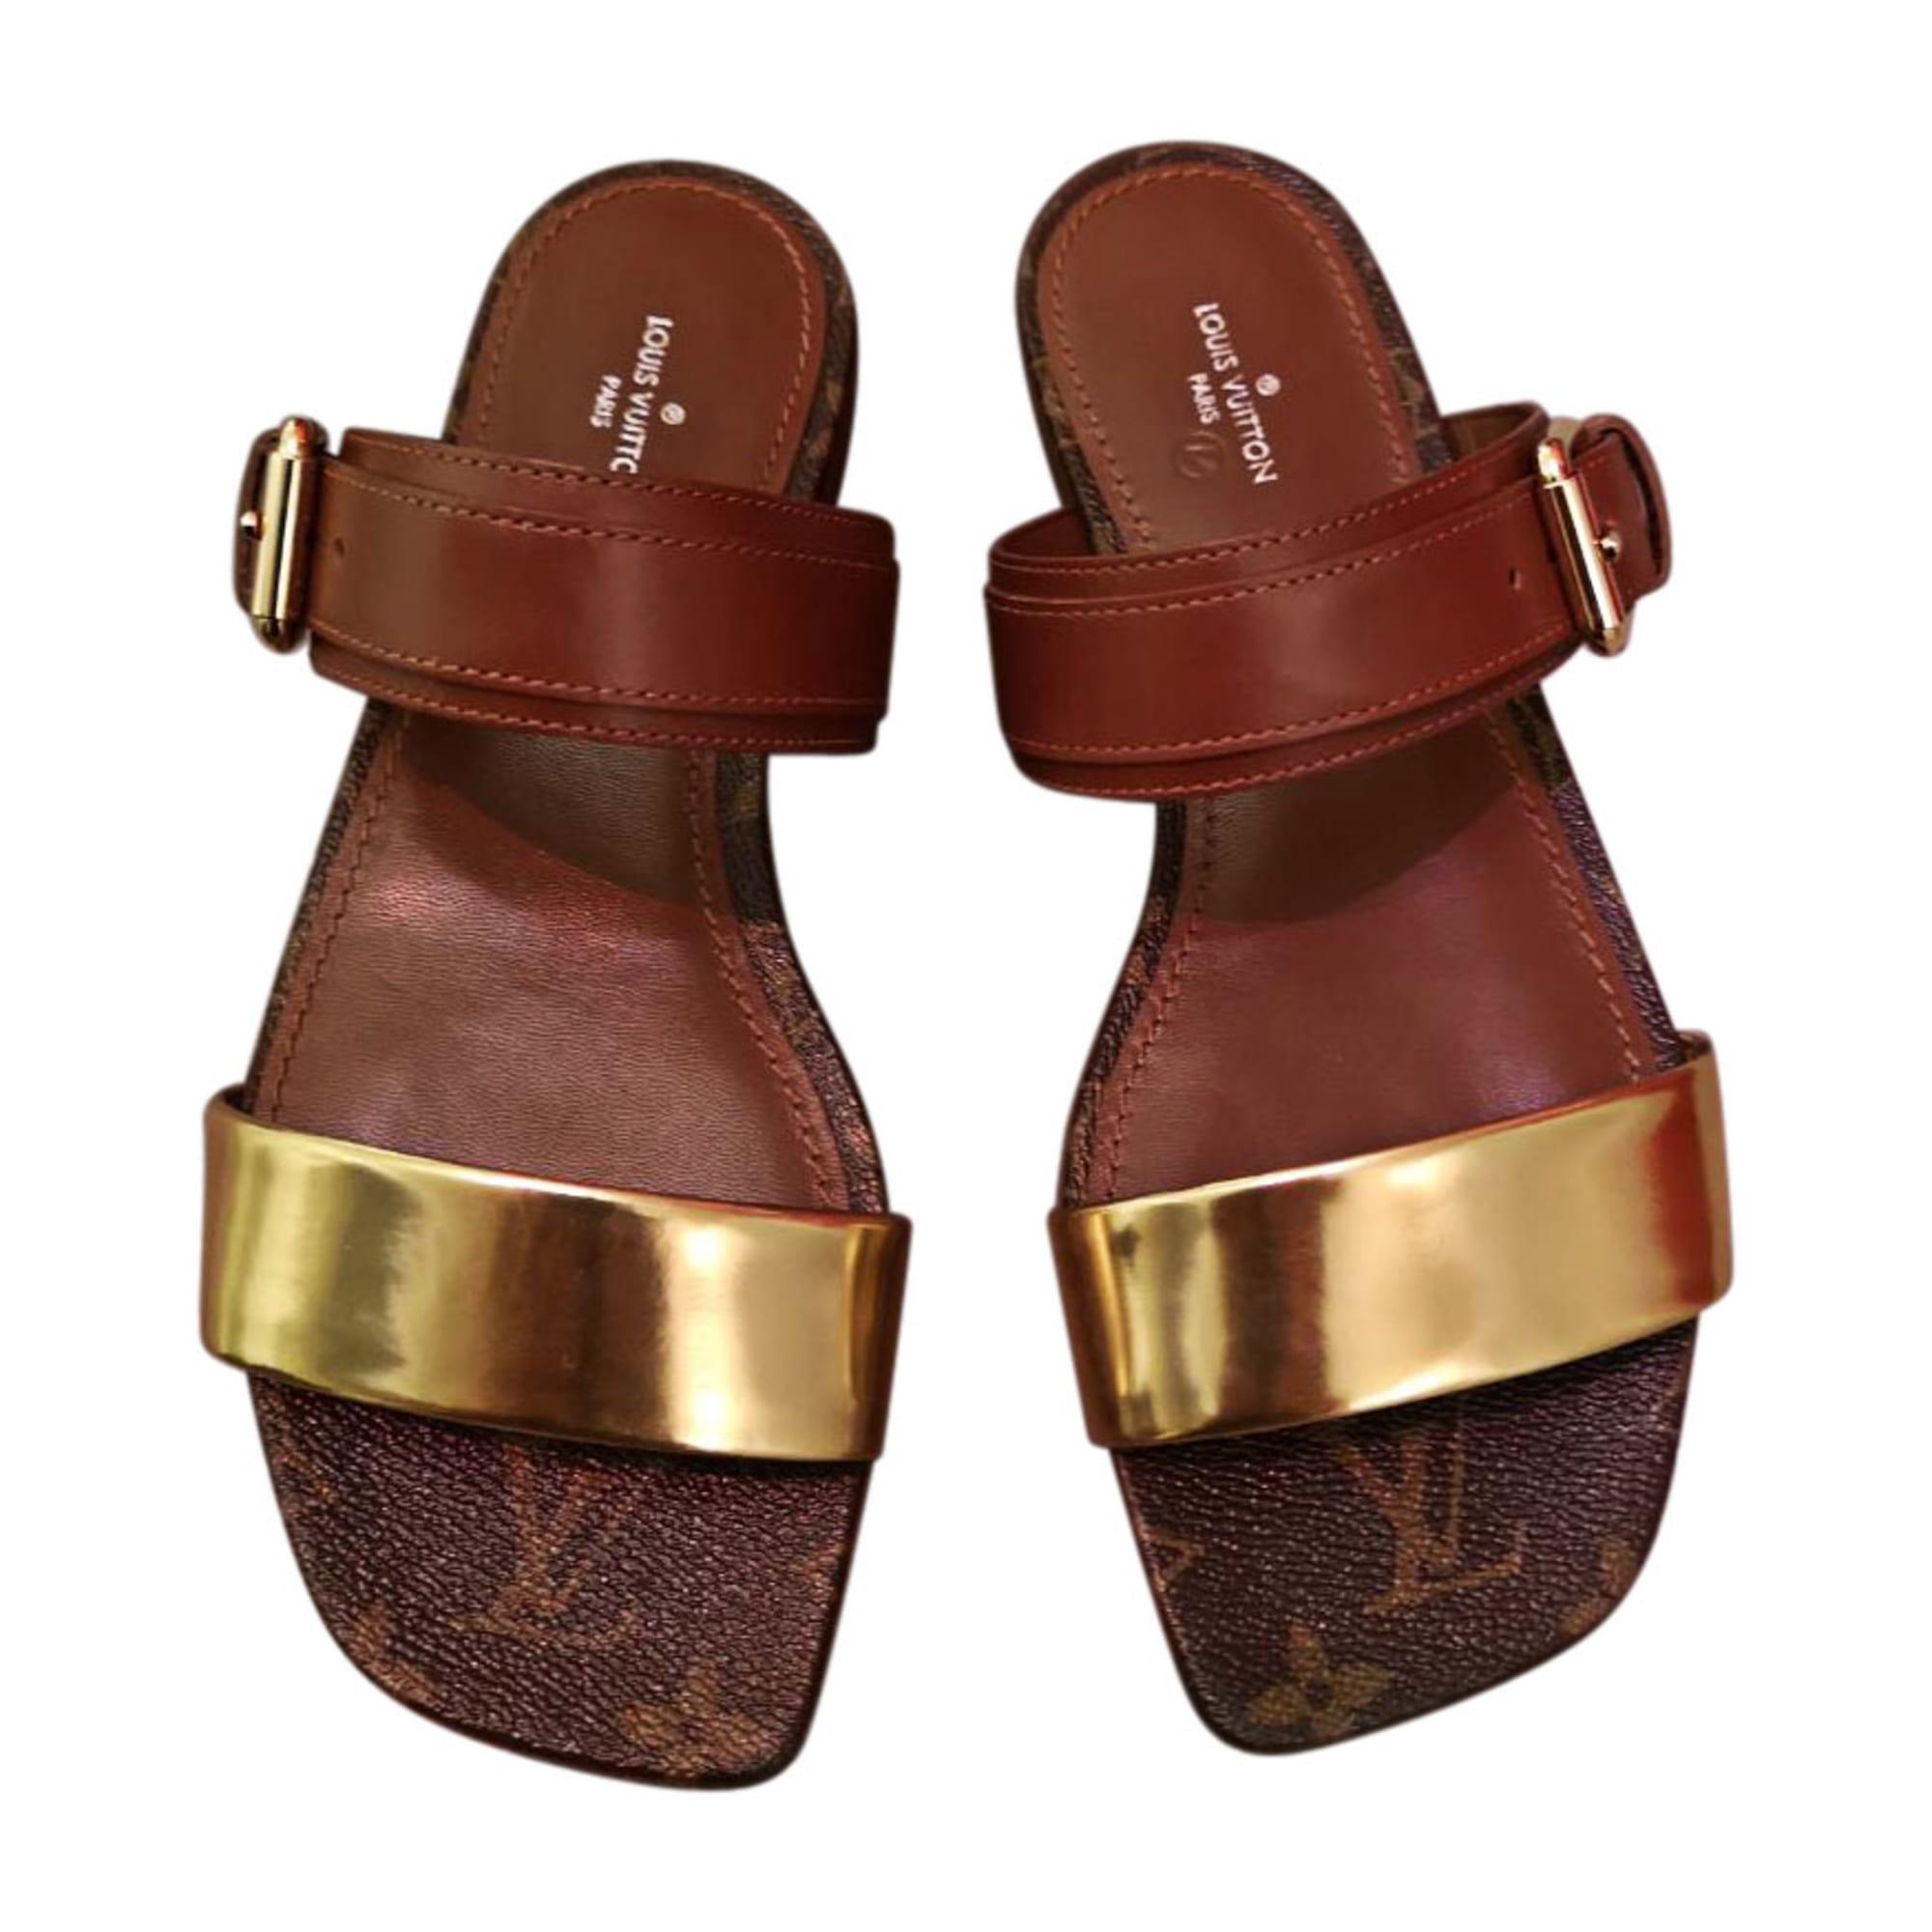 838743bdee3ddf ... Flat Sandals LOUIS VUITTON monogram et cognac half off b590e 85222 ...